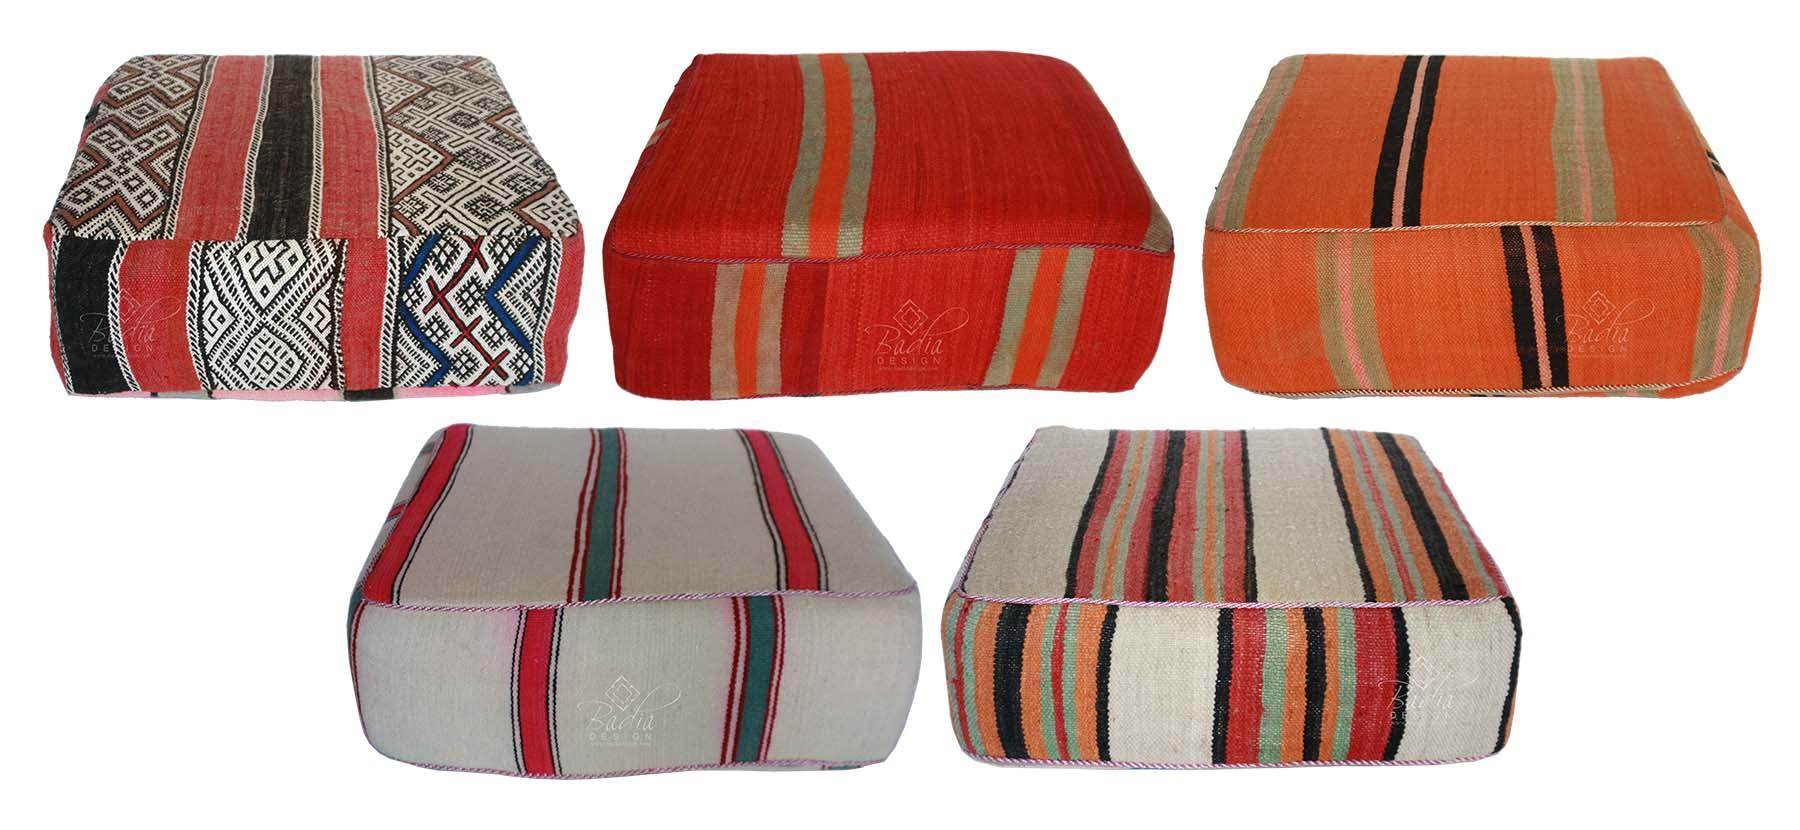 moroccan-square-shaped-kilim-floor-cushion-fp705.jpg